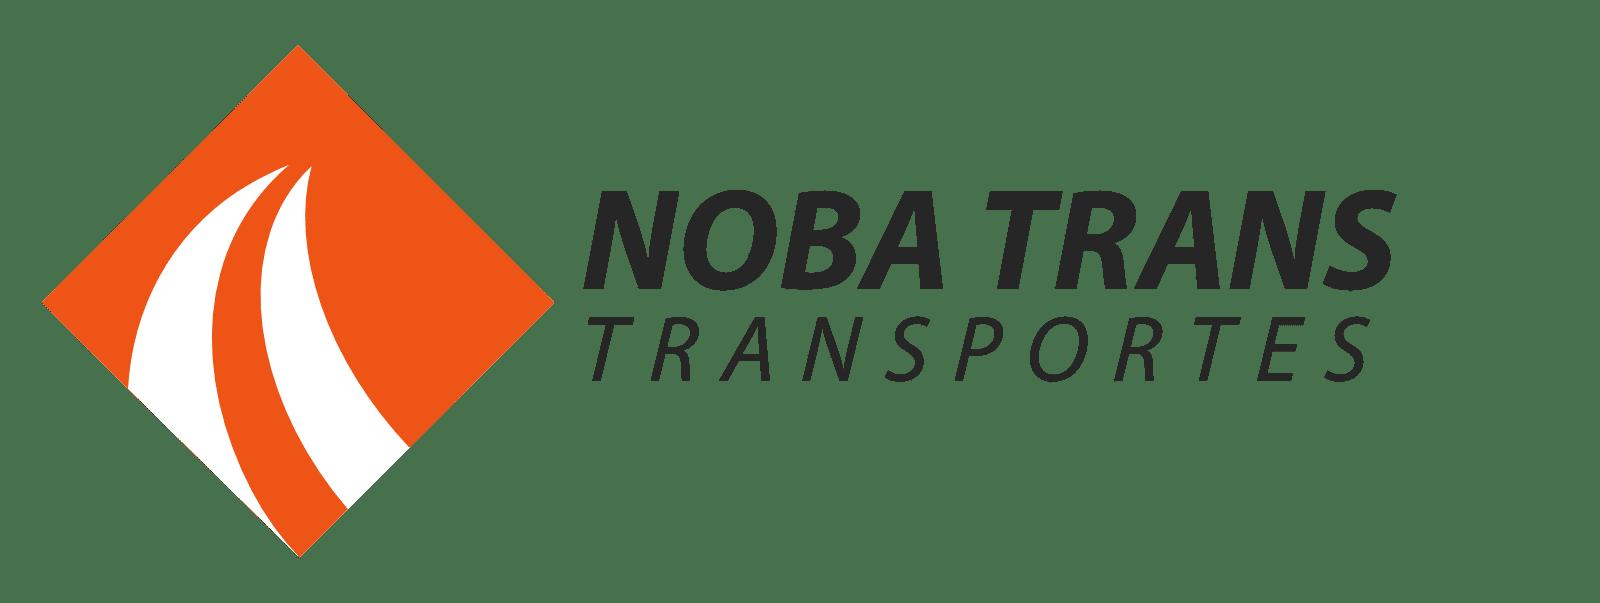 Noba Trans